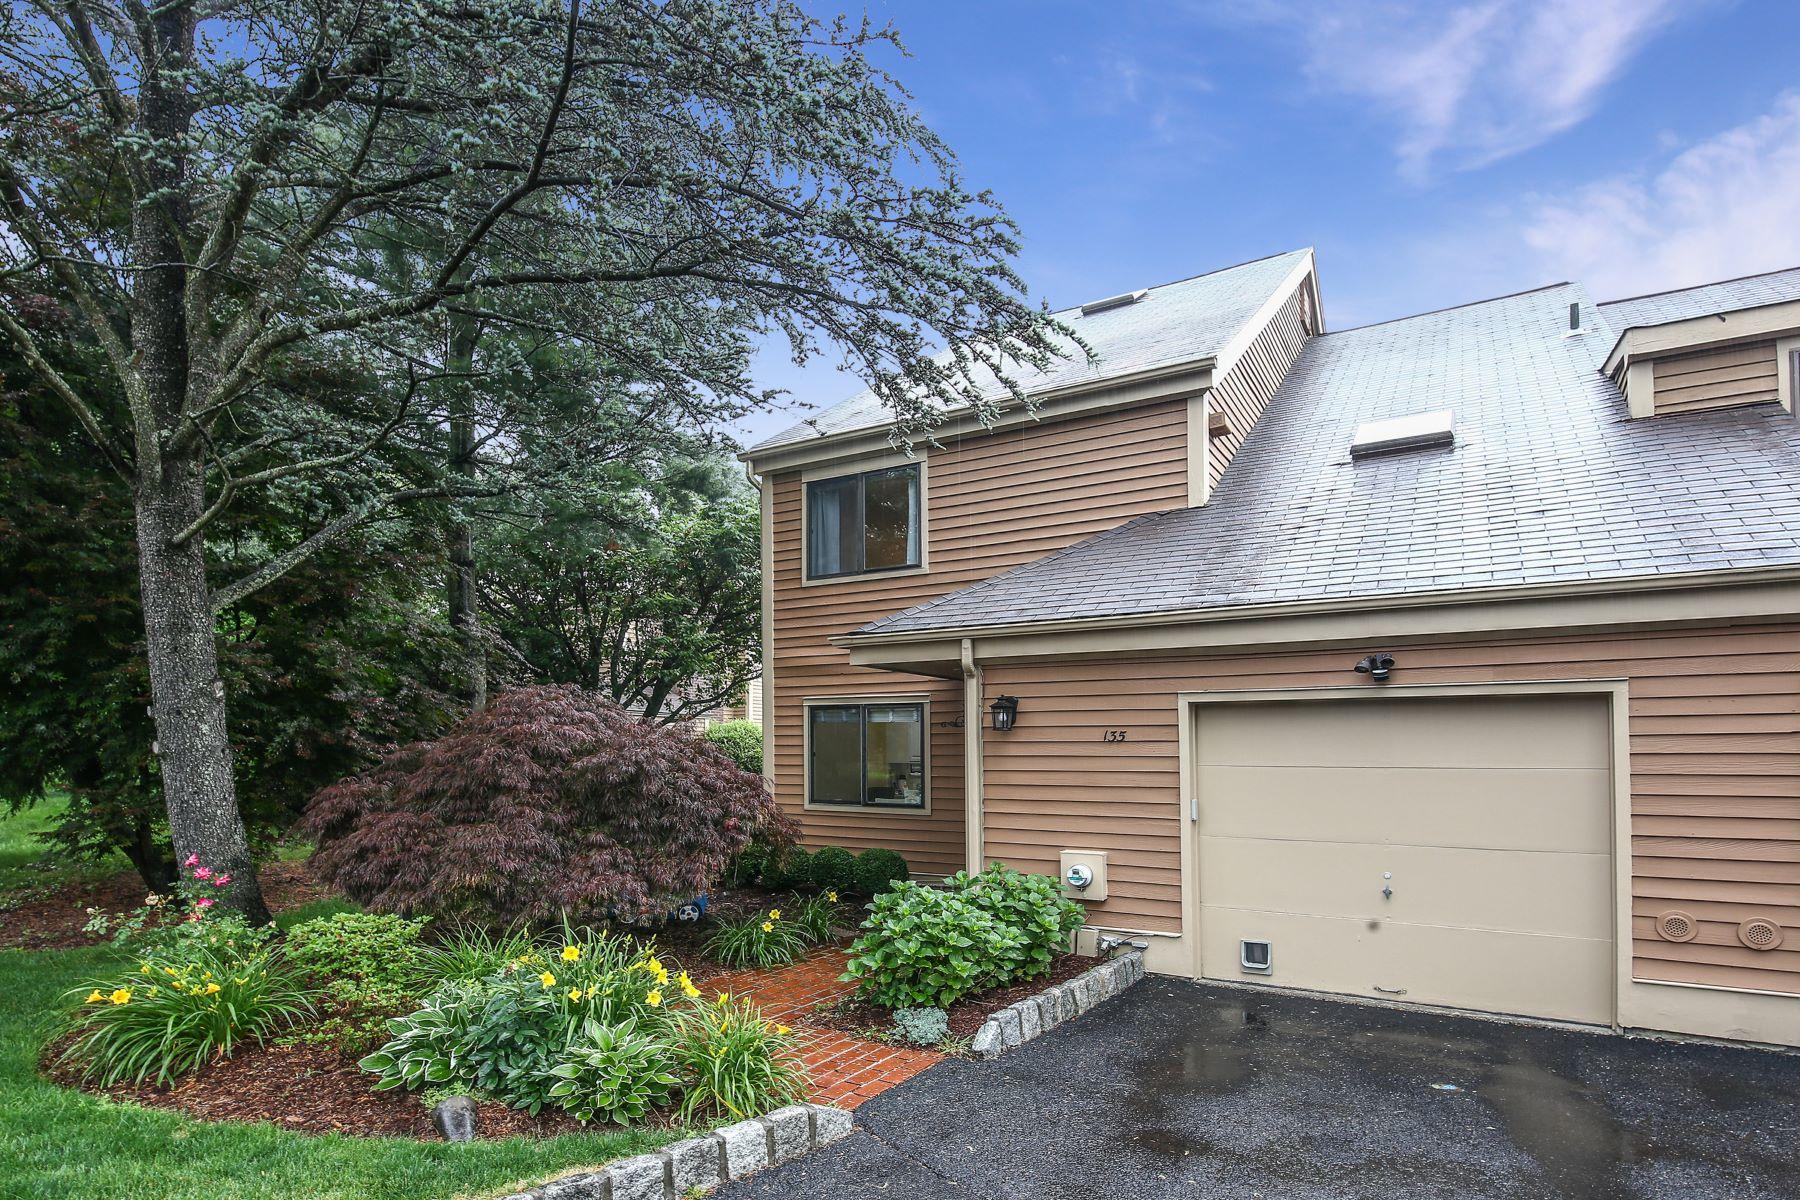 townhouses 為 出售 在 135 Brush Hollow Crescent Rye Brook, 纽约 10573 美國